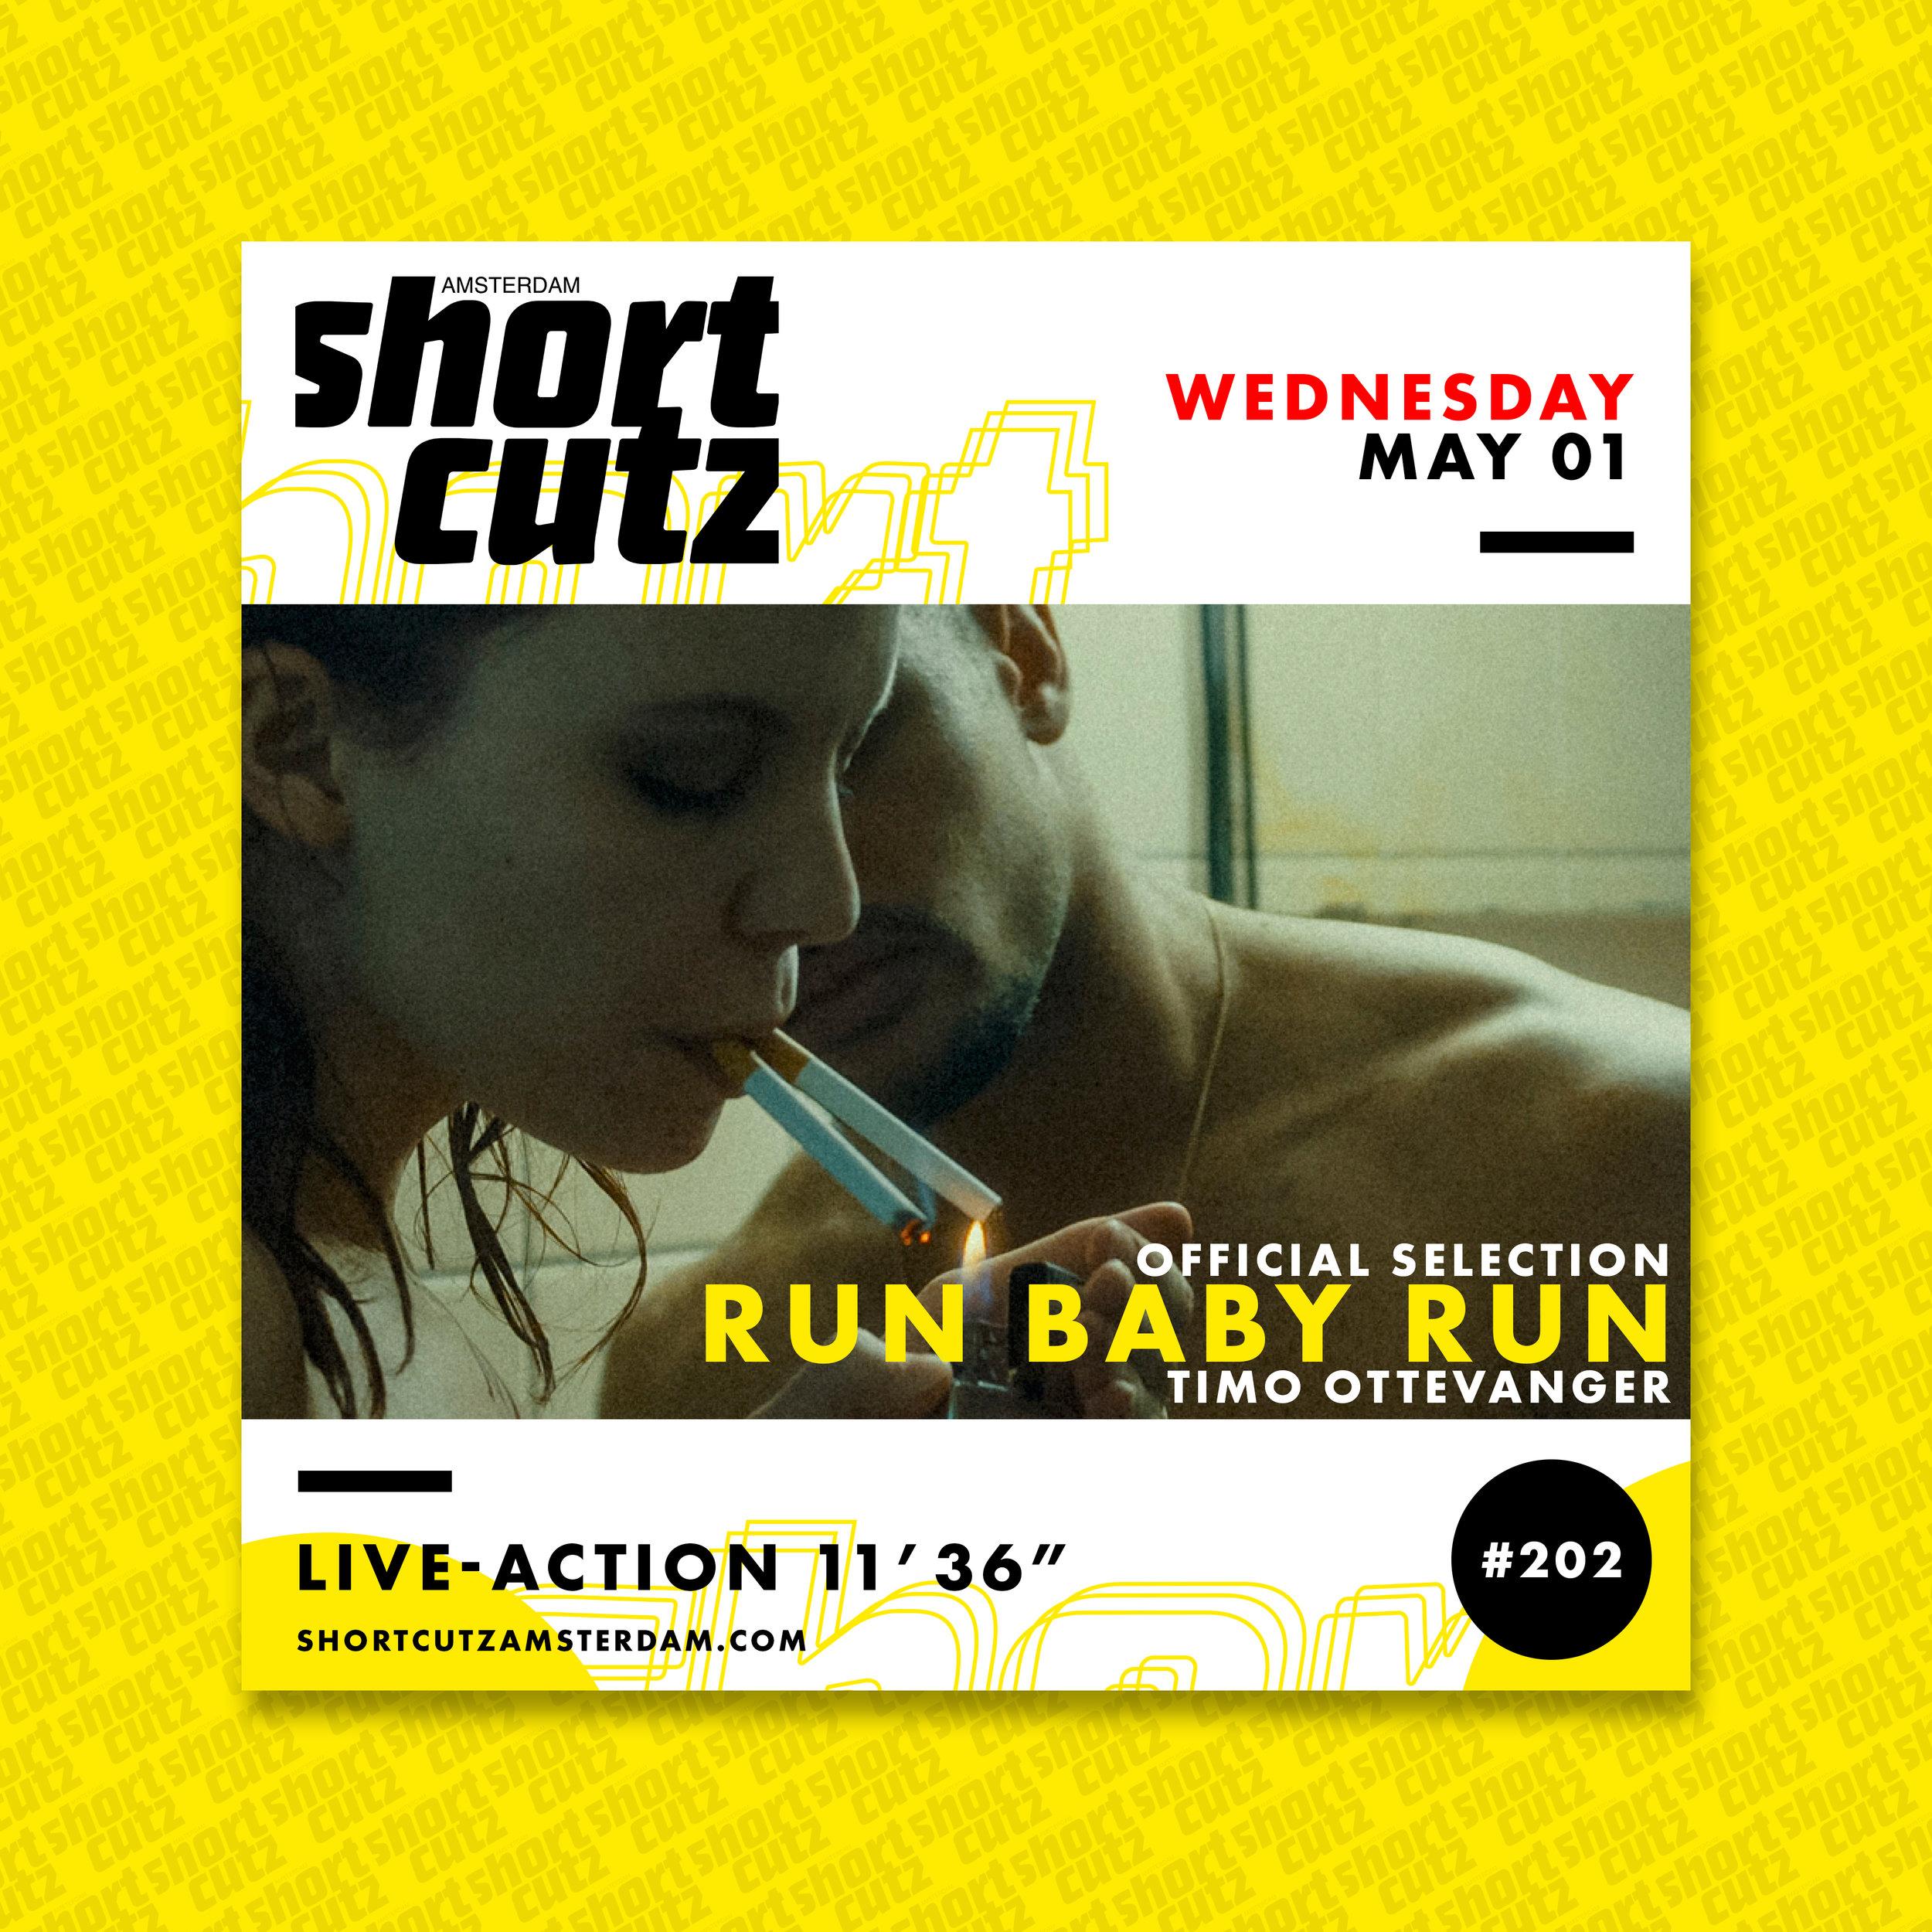 #202 Poster Run Baby Run.jpg